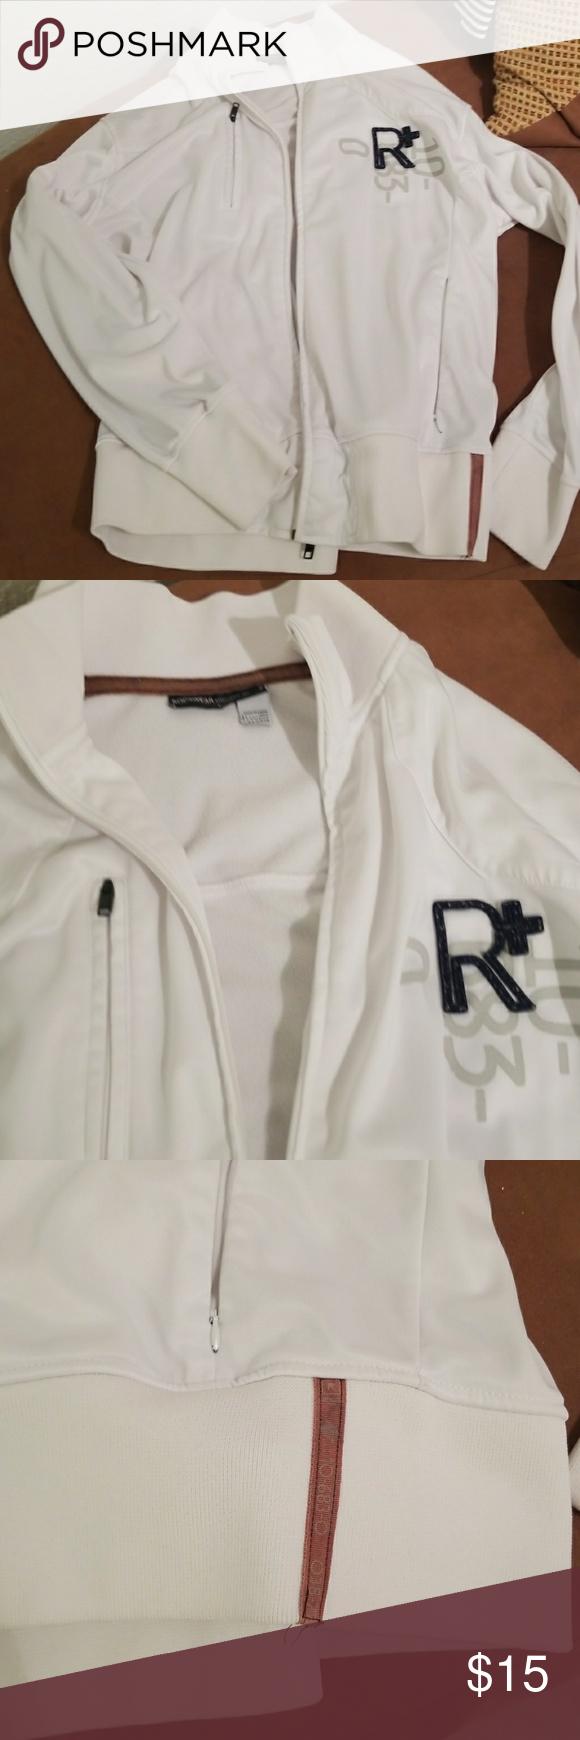 Rocawear Men S Jacket Issues With The Zipper Rocawear Jackets Coats Lightweight Shirt Jackets Jackets Rocawear Mens Jackets [ 1740 x 580 Pixel ]